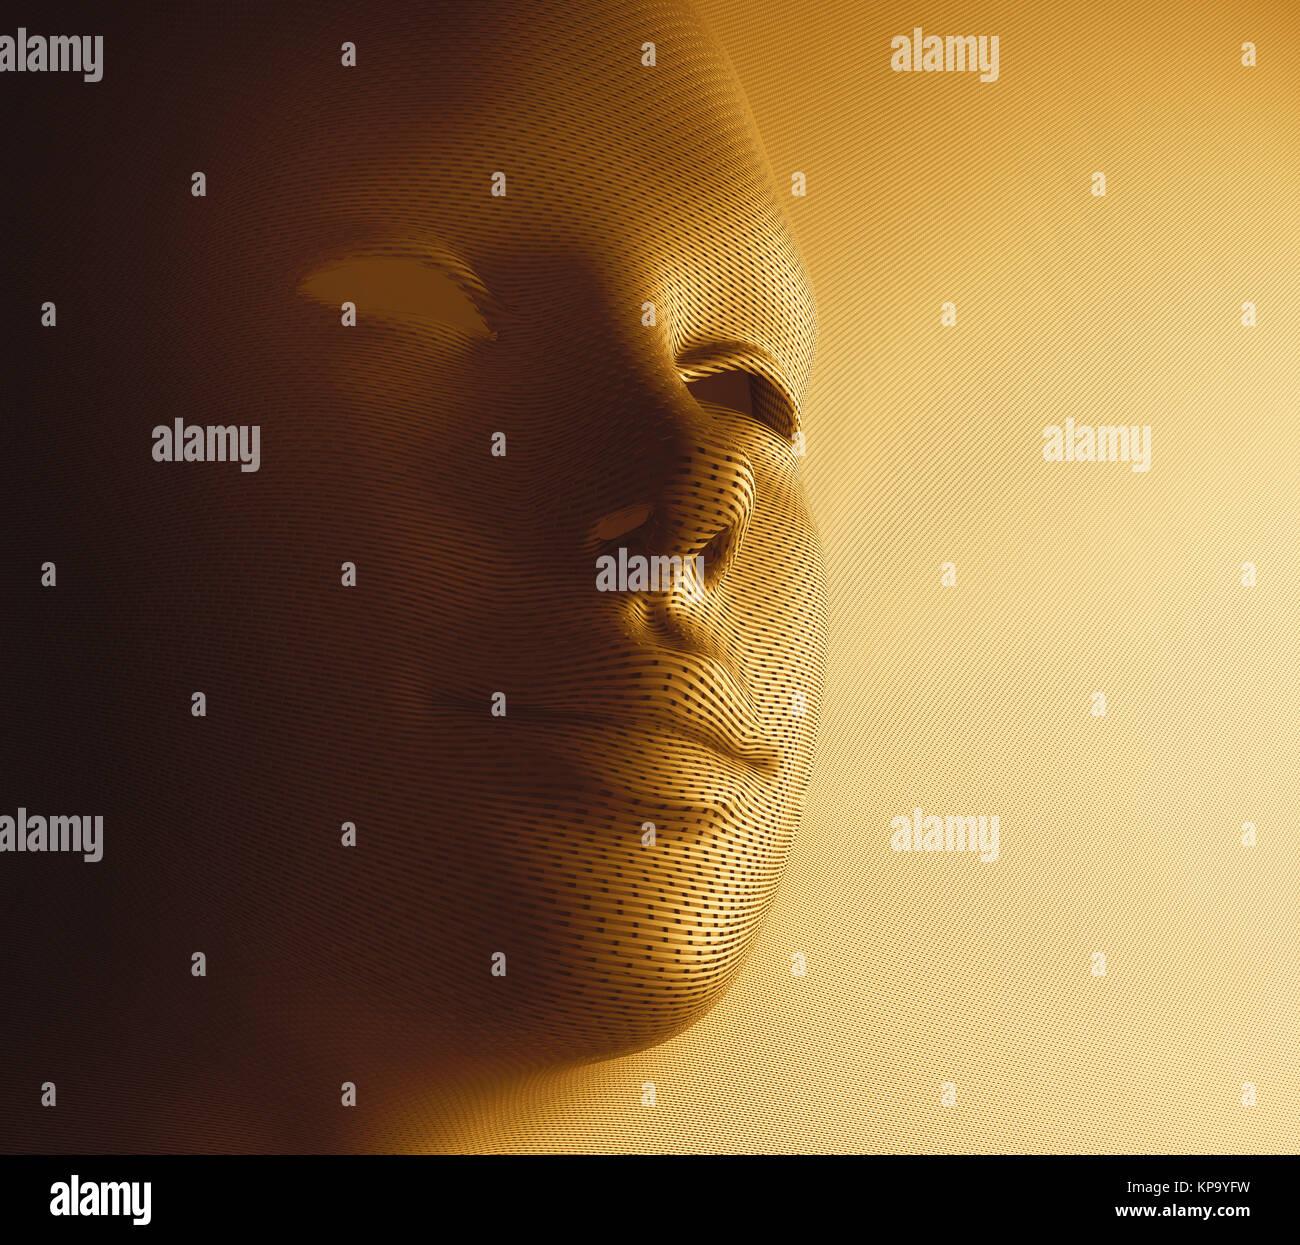 Golden Mask - Stock Image